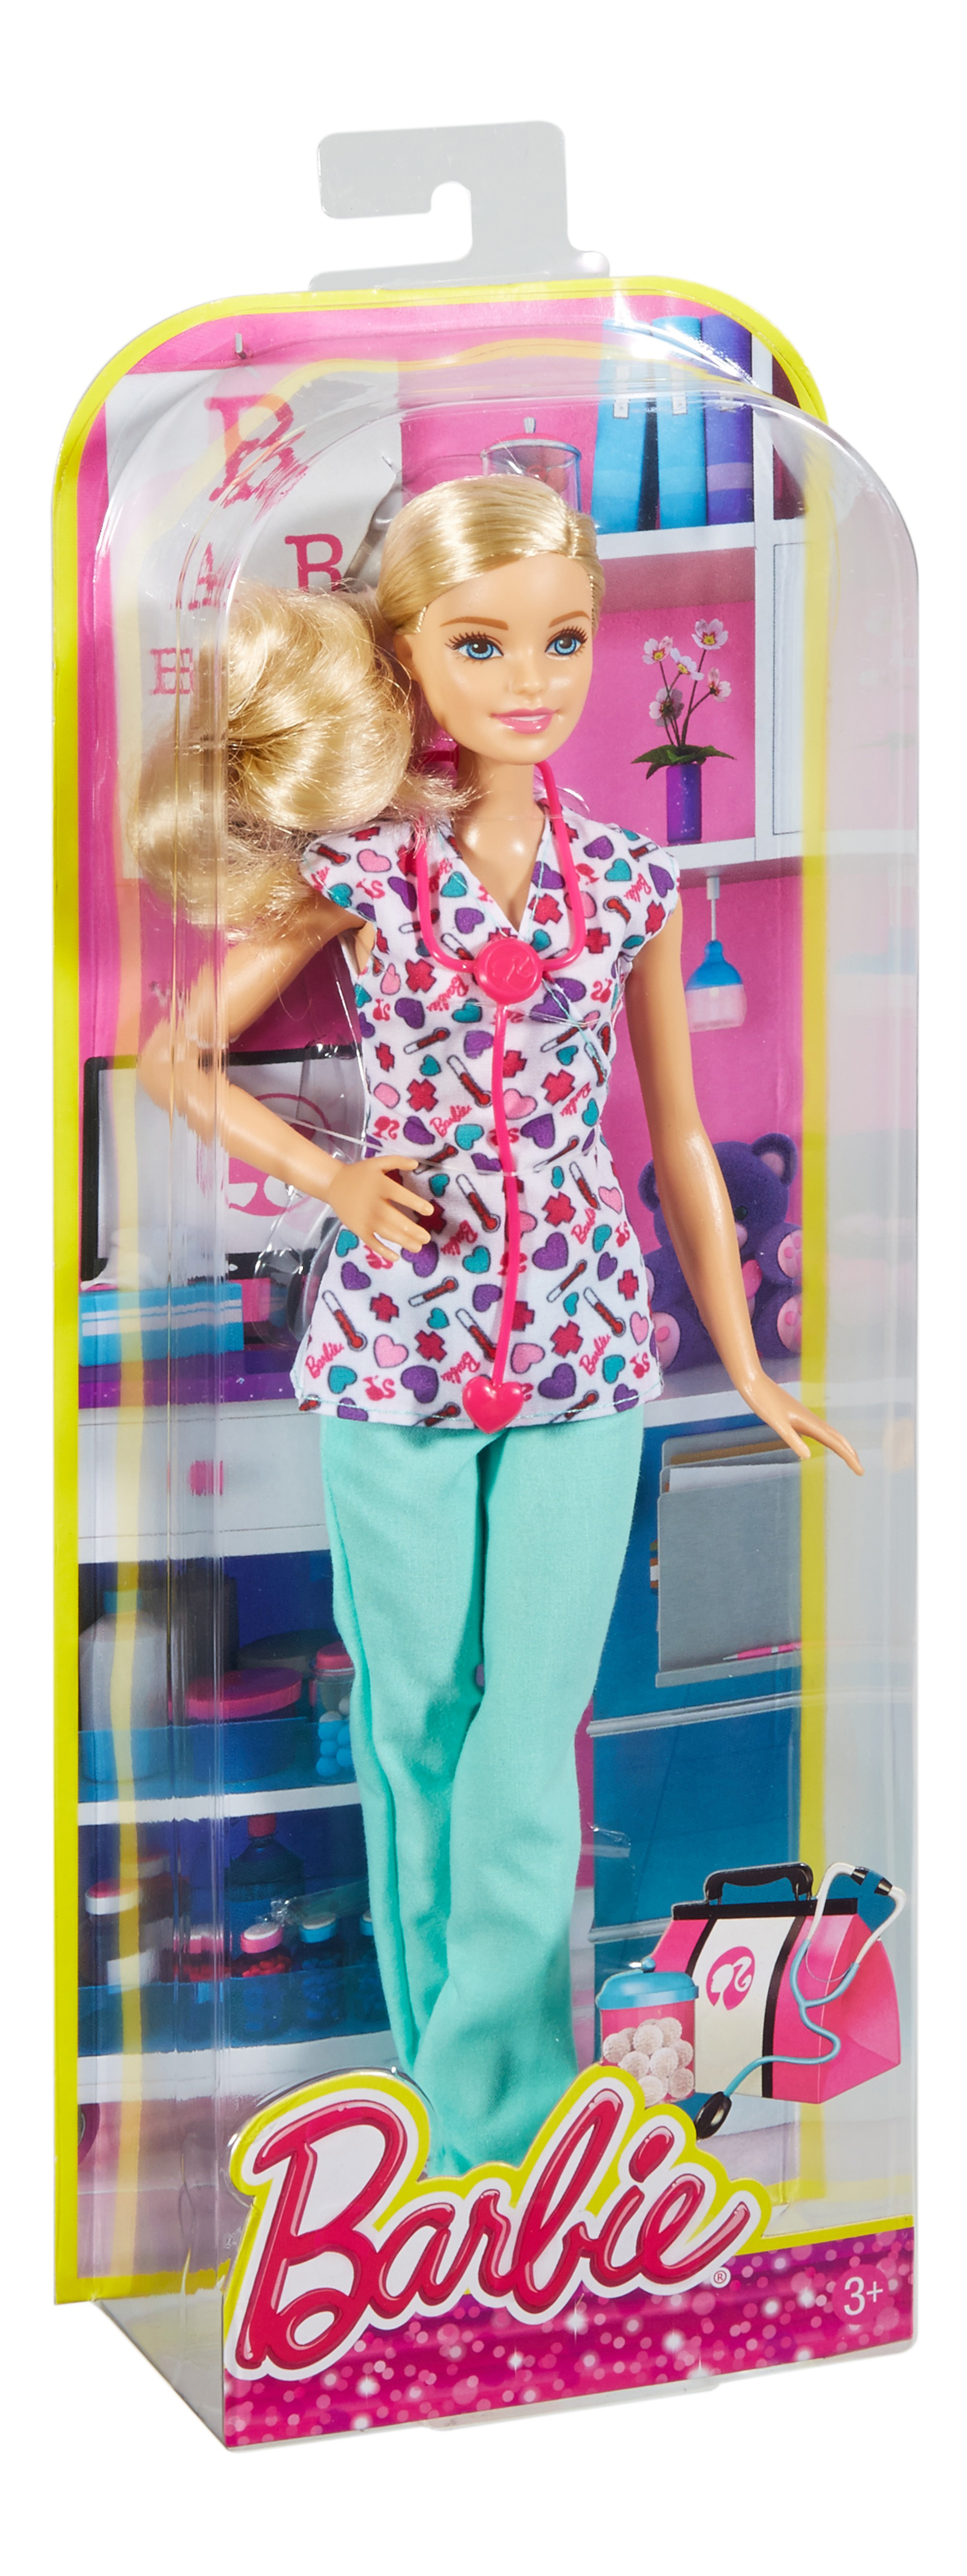 Кукла Barbie из серии Профессии DHB18 DMP54